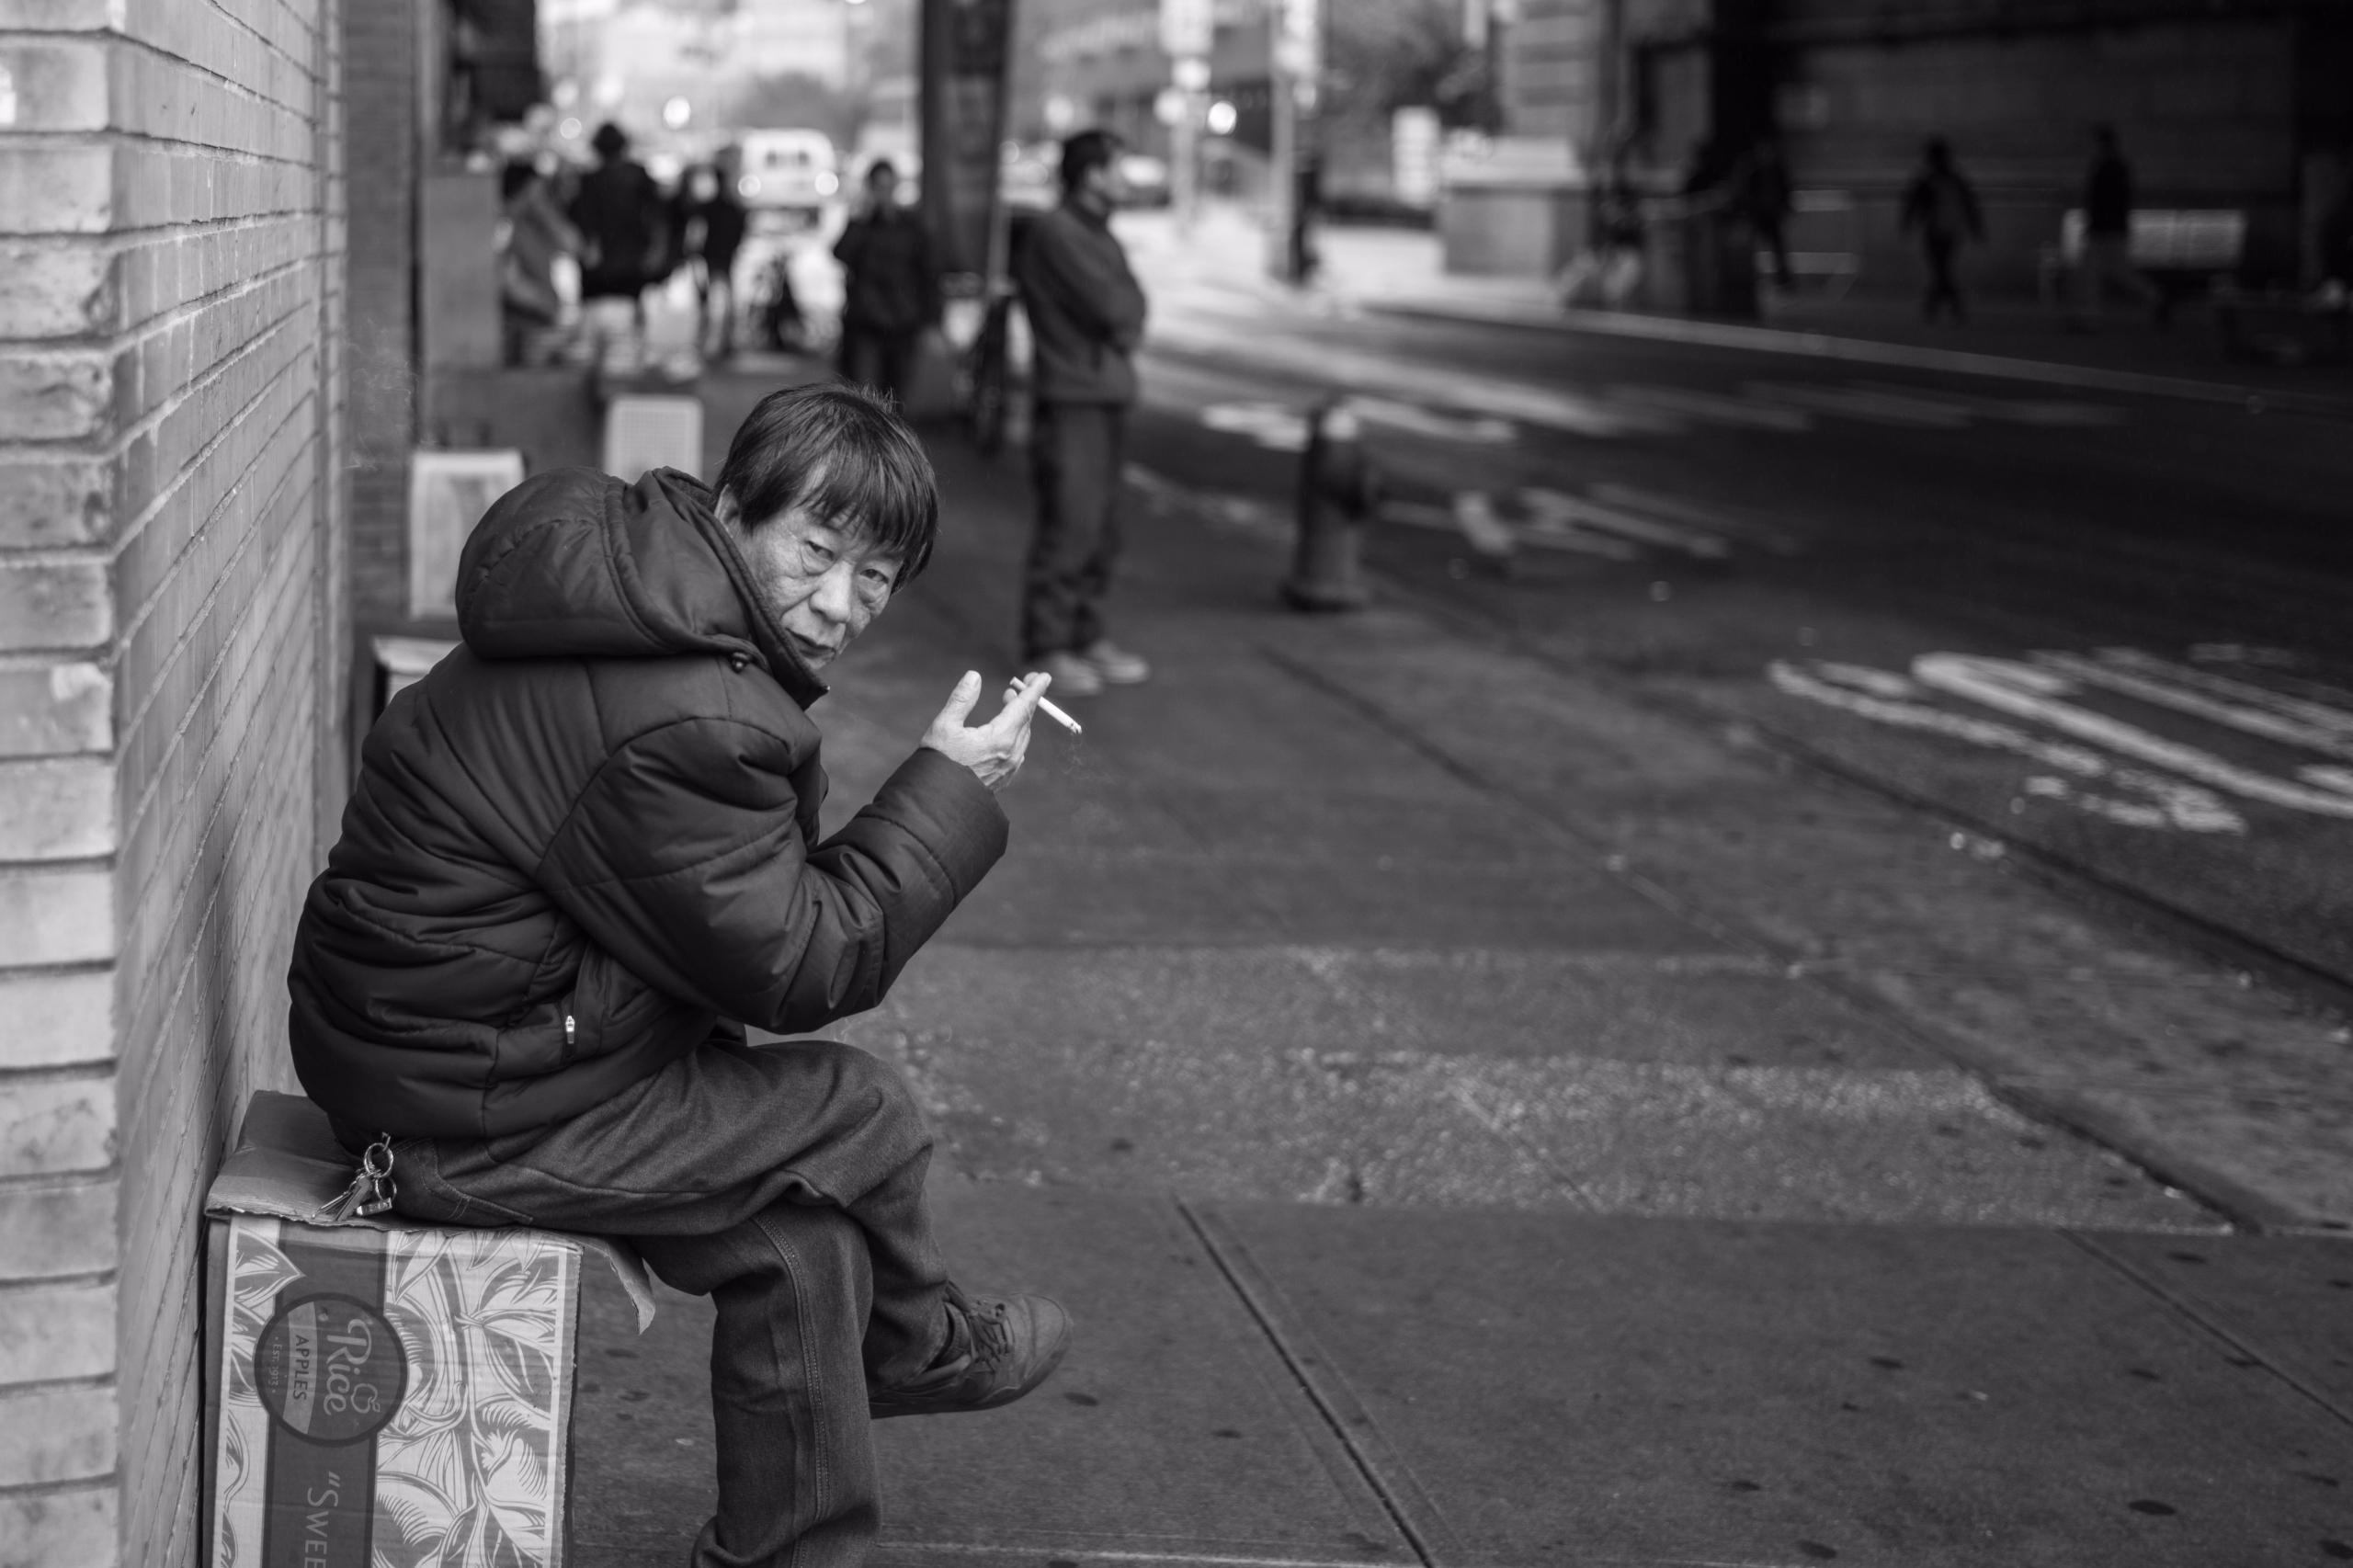 Box Chair Chinatown - giseleduprez | ello